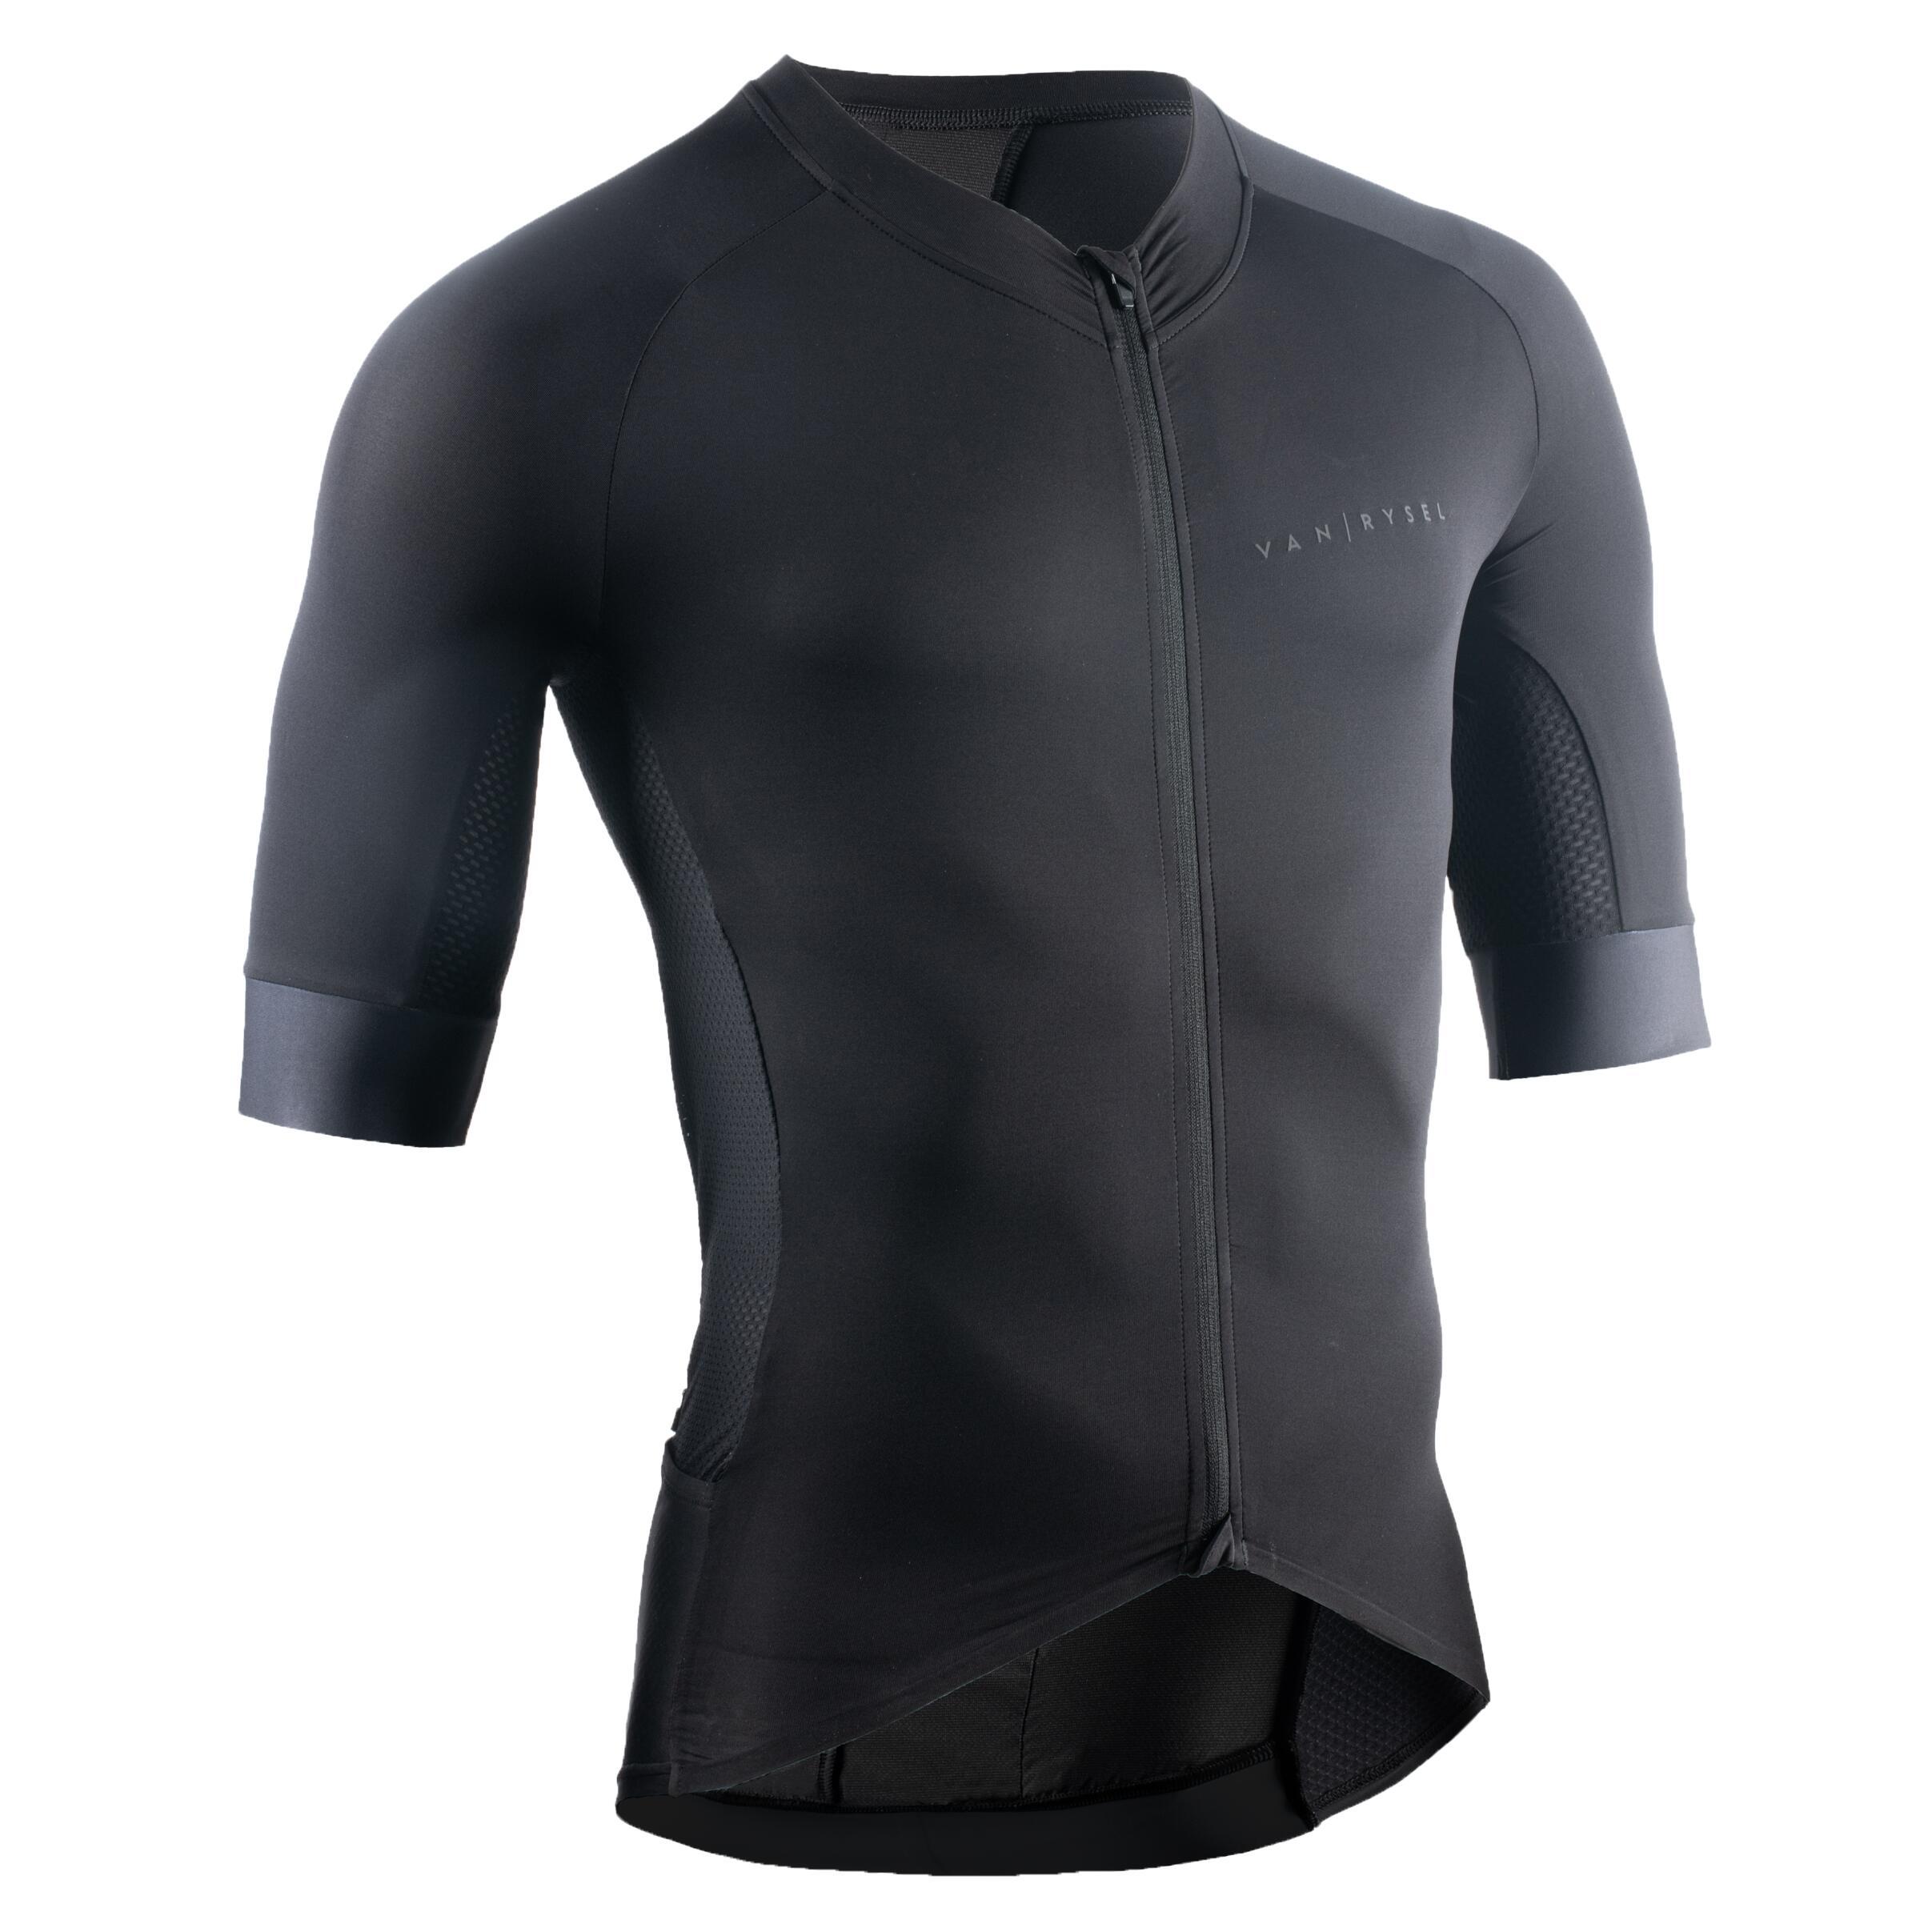 Tricou ciclism Racer Bărbați imagine